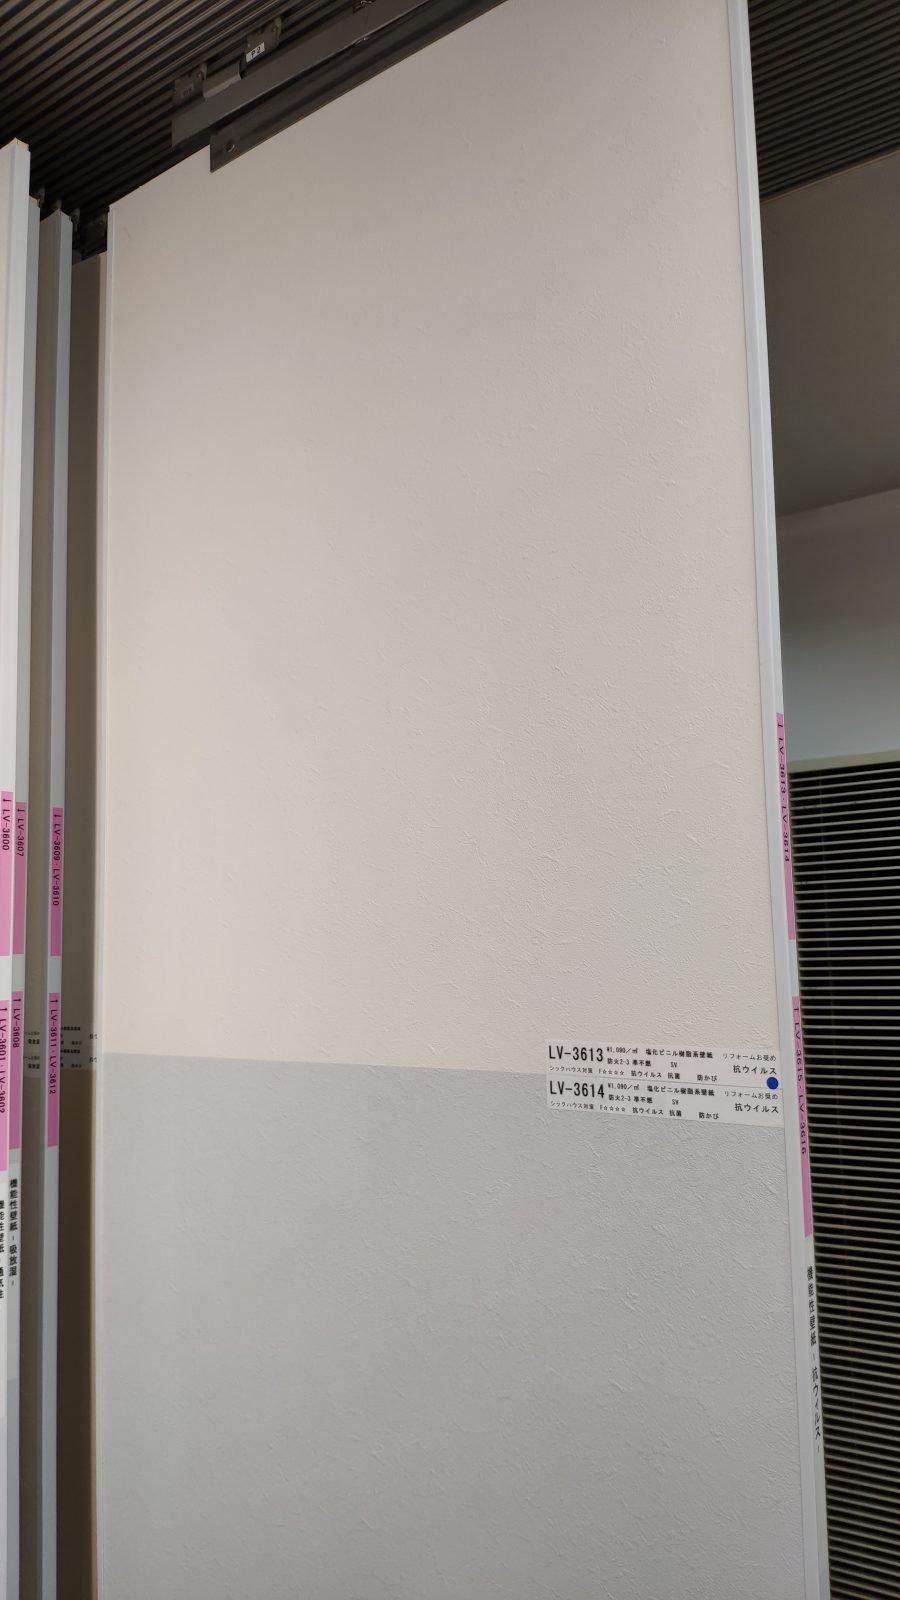 LV-3613(LTS431) / LV-3614